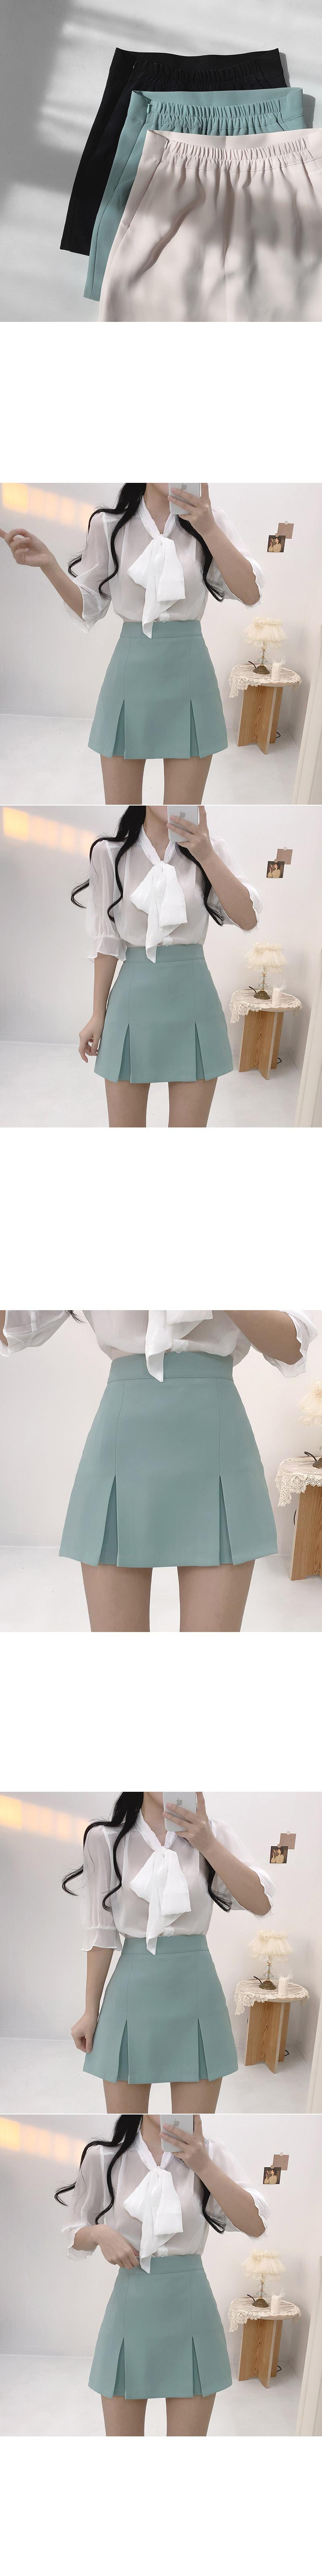 Queen's split pleated skirt